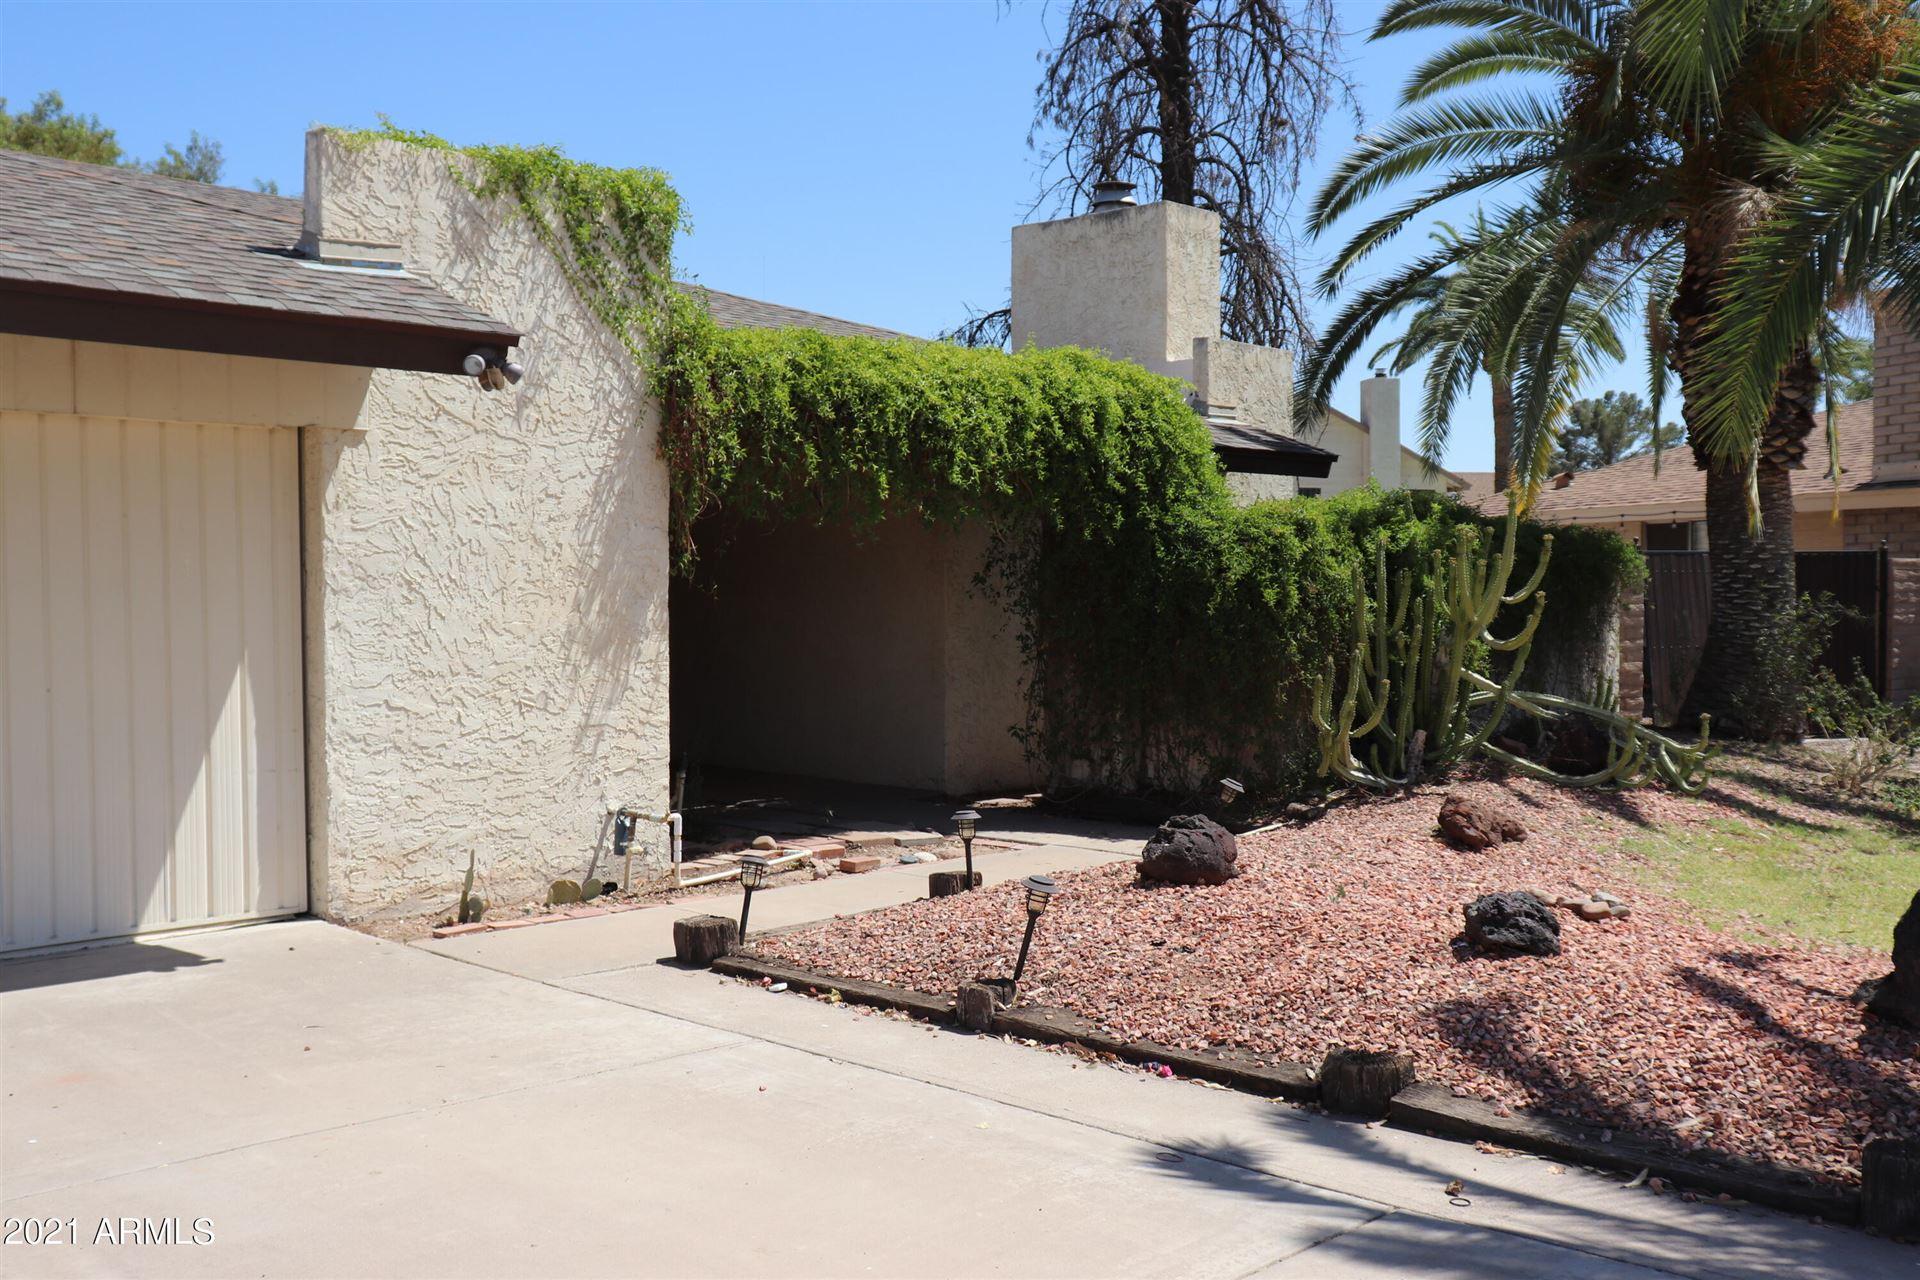 Photo of 1707 S SYCAMORE --, Mesa, AZ 85202 (MLS # 6231561)